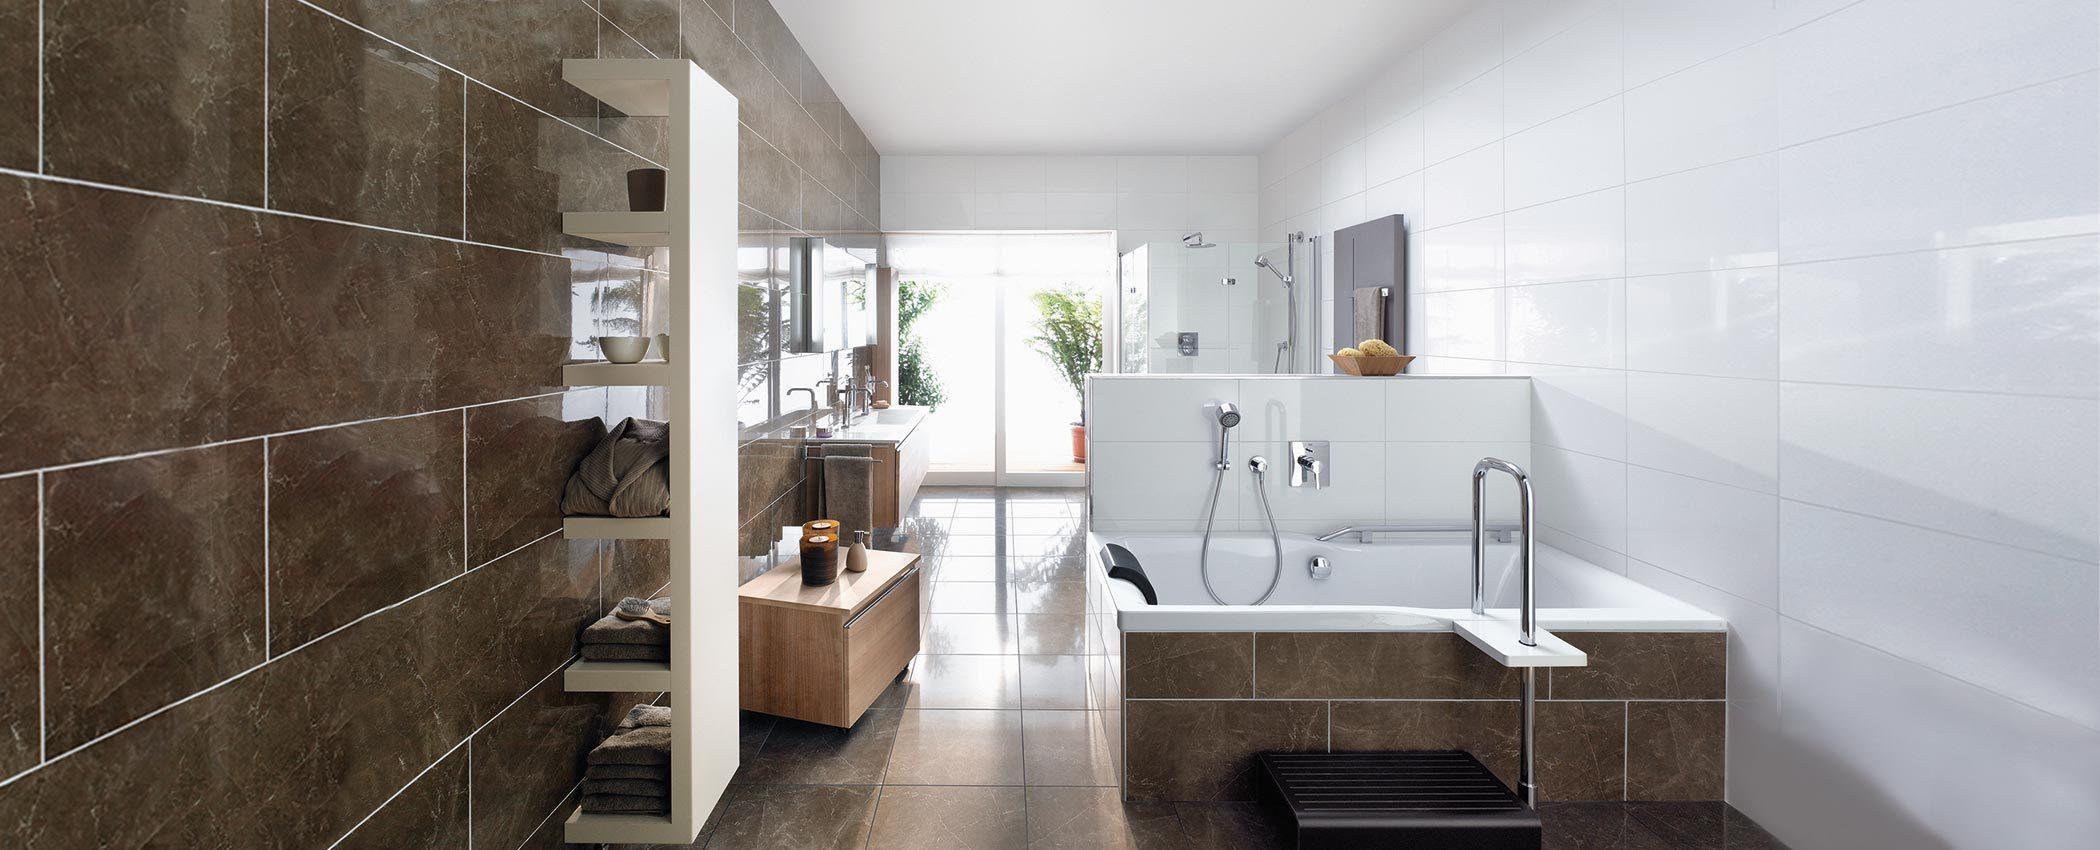 Wellness Haustechnik Rausch – Bäder – Sanitär – Installation – Heizung